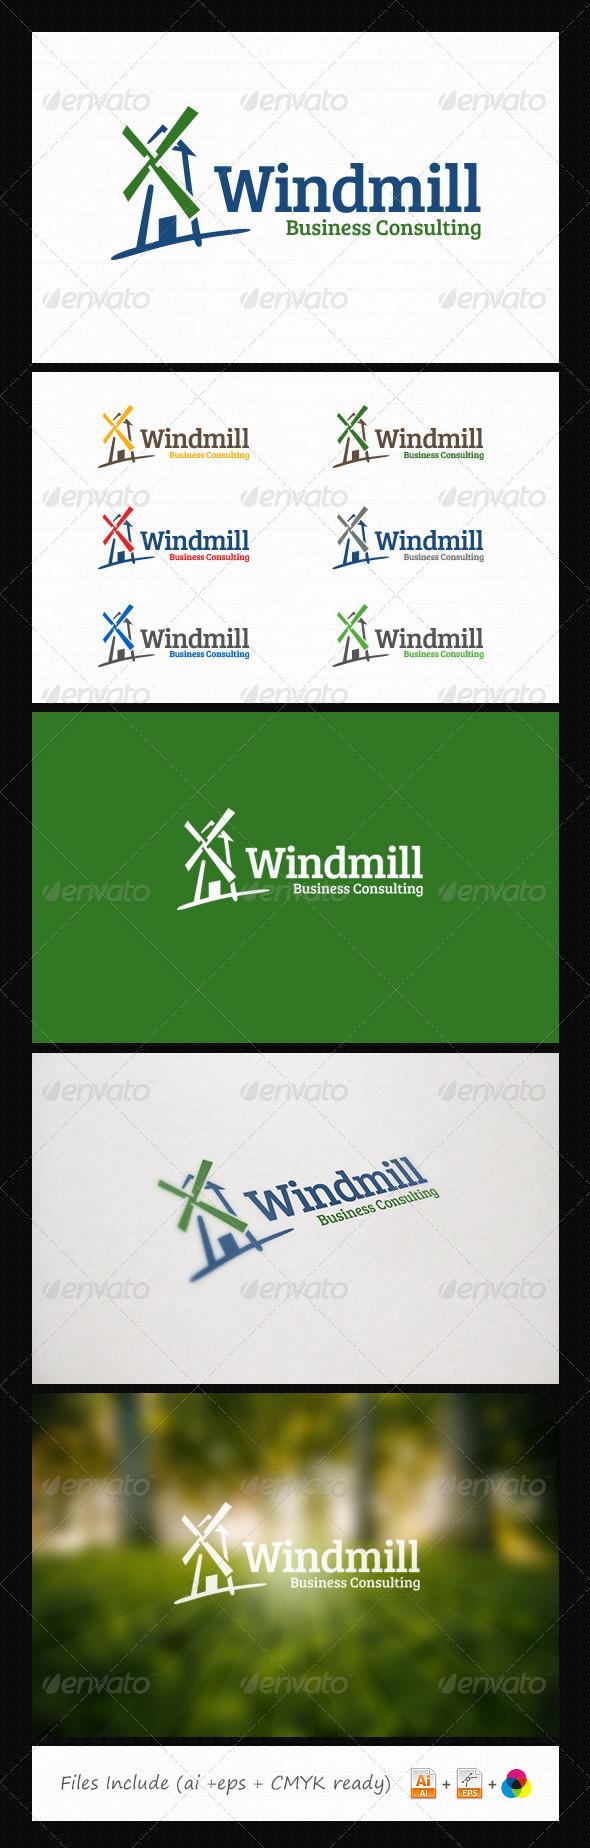 GraphicRiver Windmill Consulting Logo 6059572